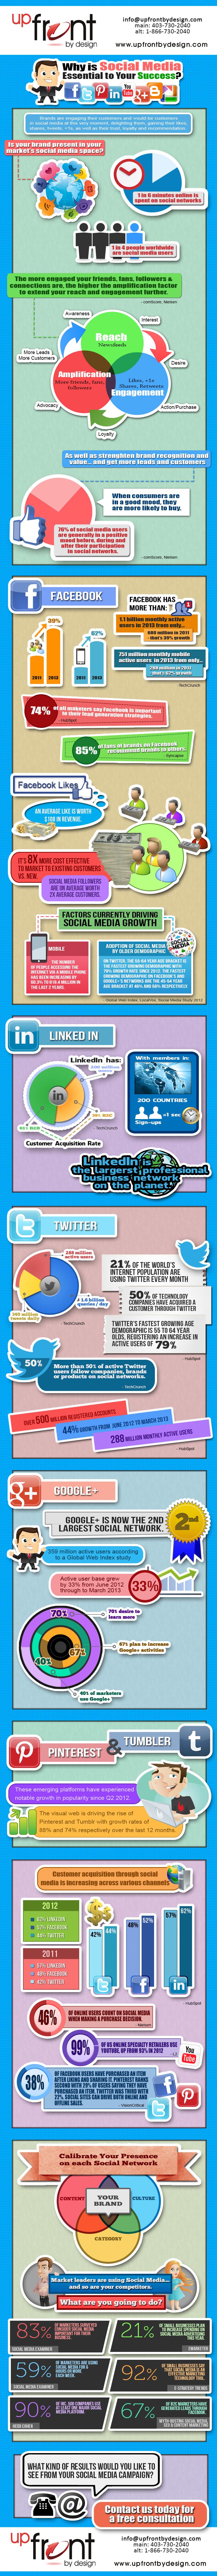 UpFrontByDesign.com-Social-Media-Optimization-Infographic-2013